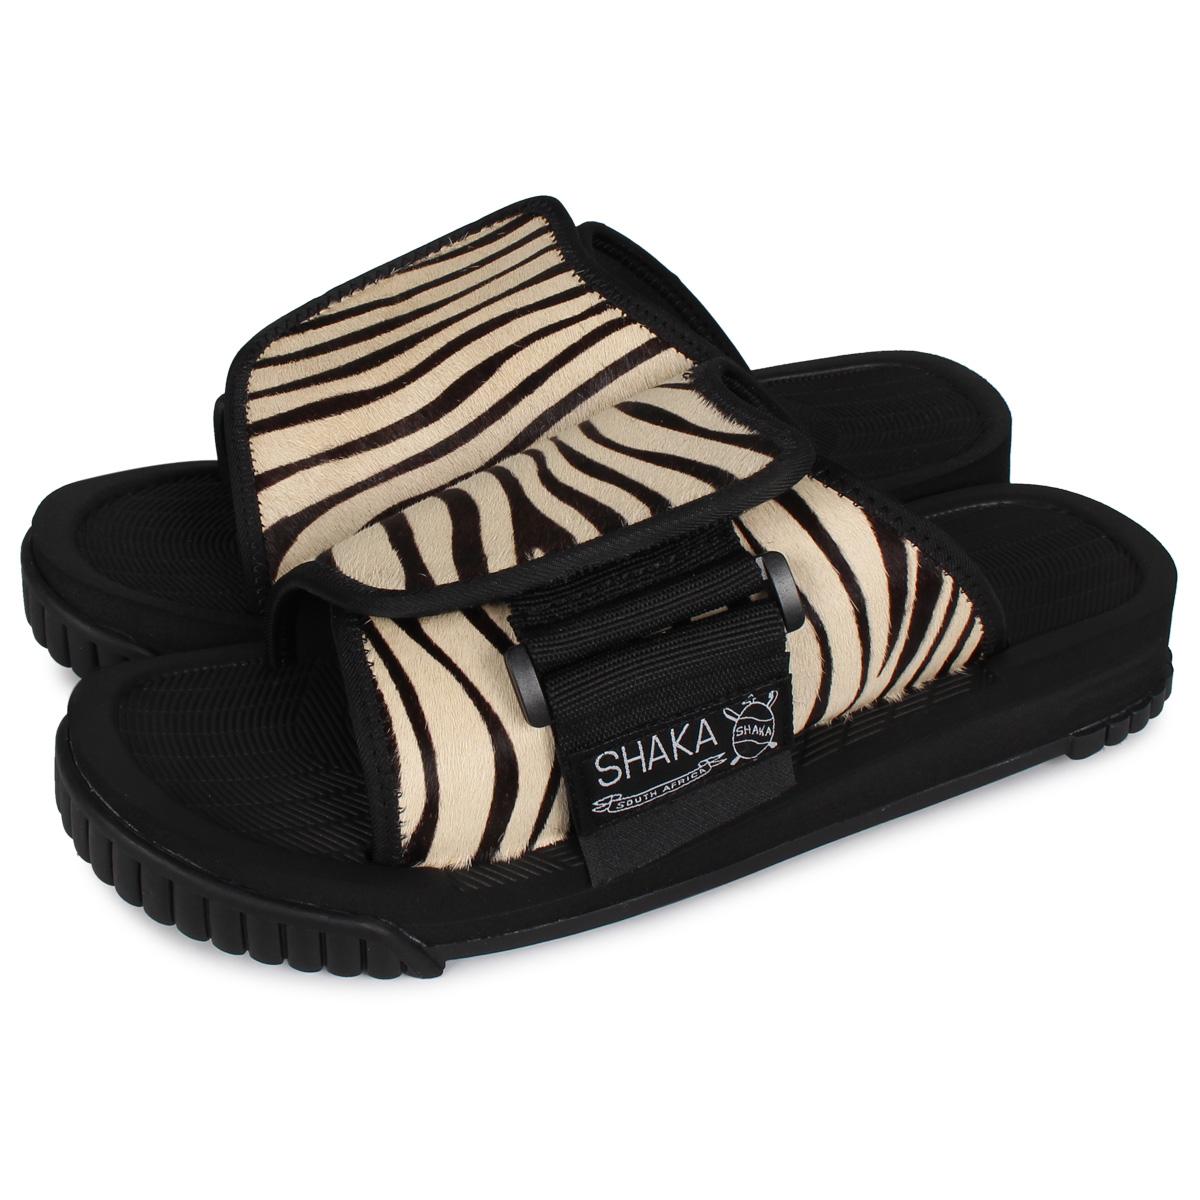 SHAKA X-PACKER COWHAIR シャカ サンダル スライドサンダル エックスパッカー カウヘアー メンズ レディース ゼブラ ホワイト 白 433153 [4/23 新入荷]